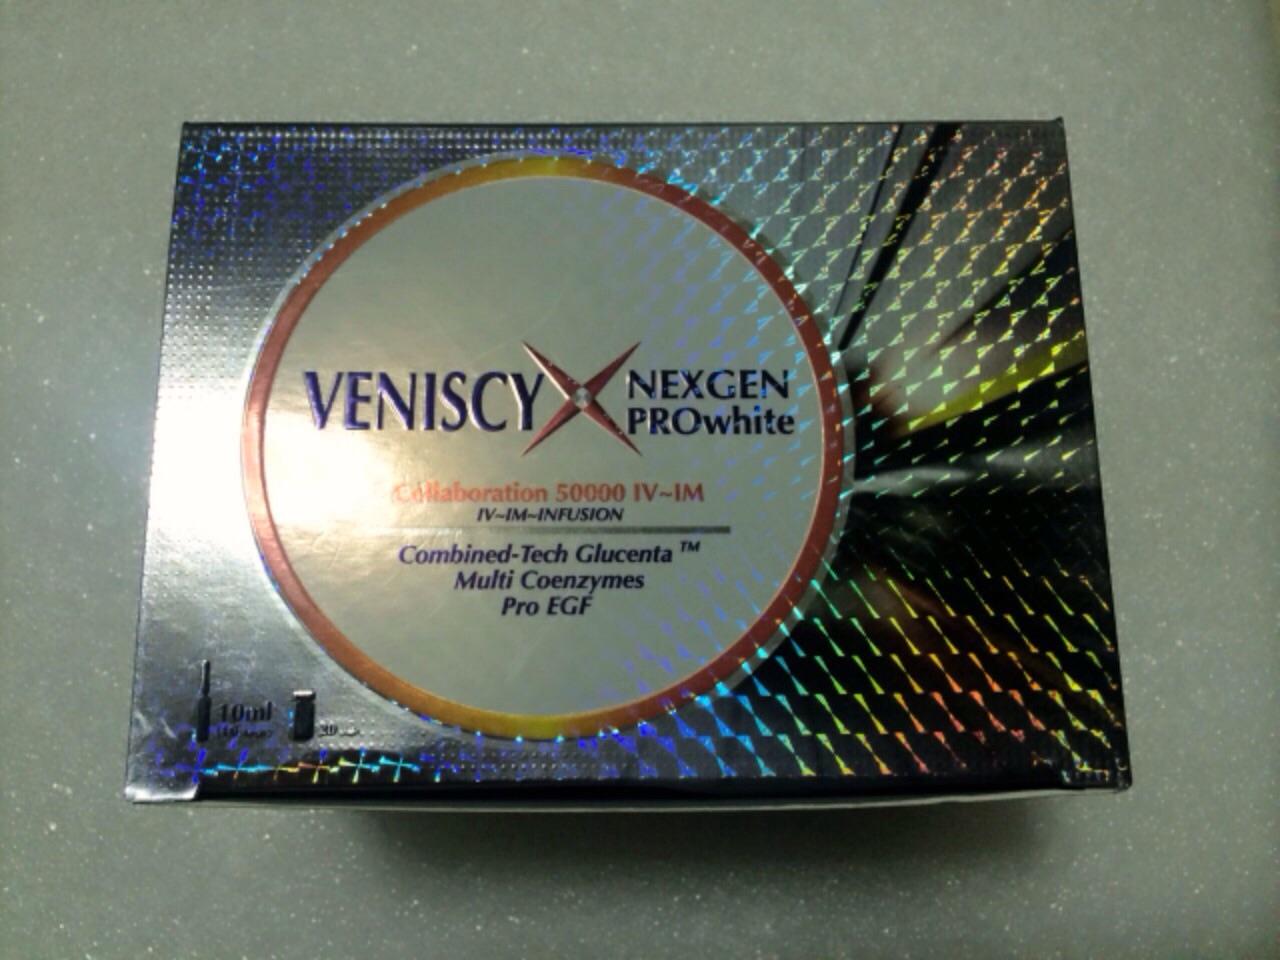 Veniscy Nexgen Prowhite